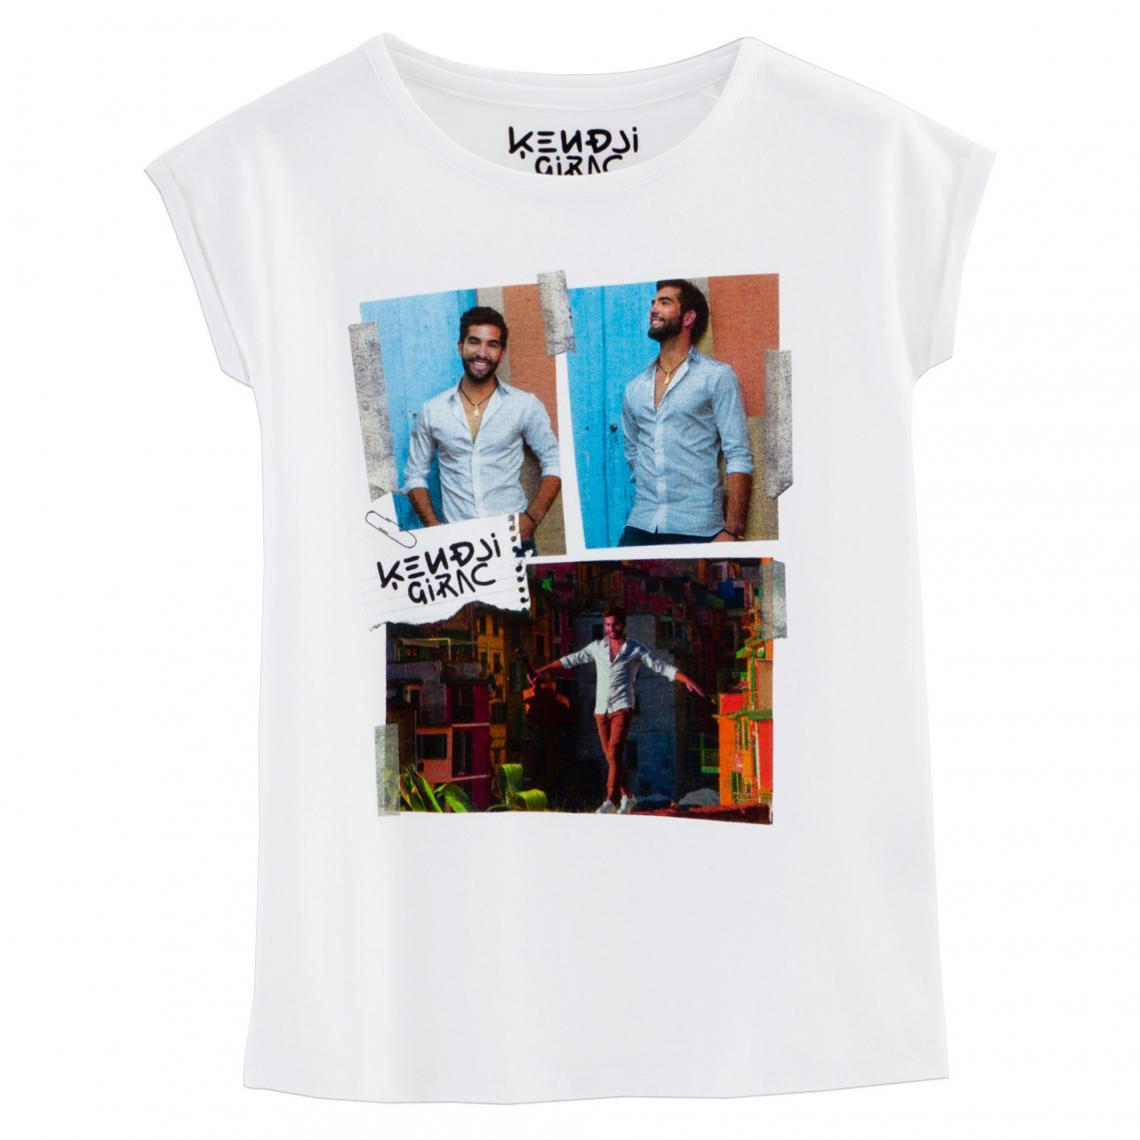 bd1a7e934abb9 T-Shirt Kendji Girac à manches courtes fille Universal - Blanc Universal  Music Enfant